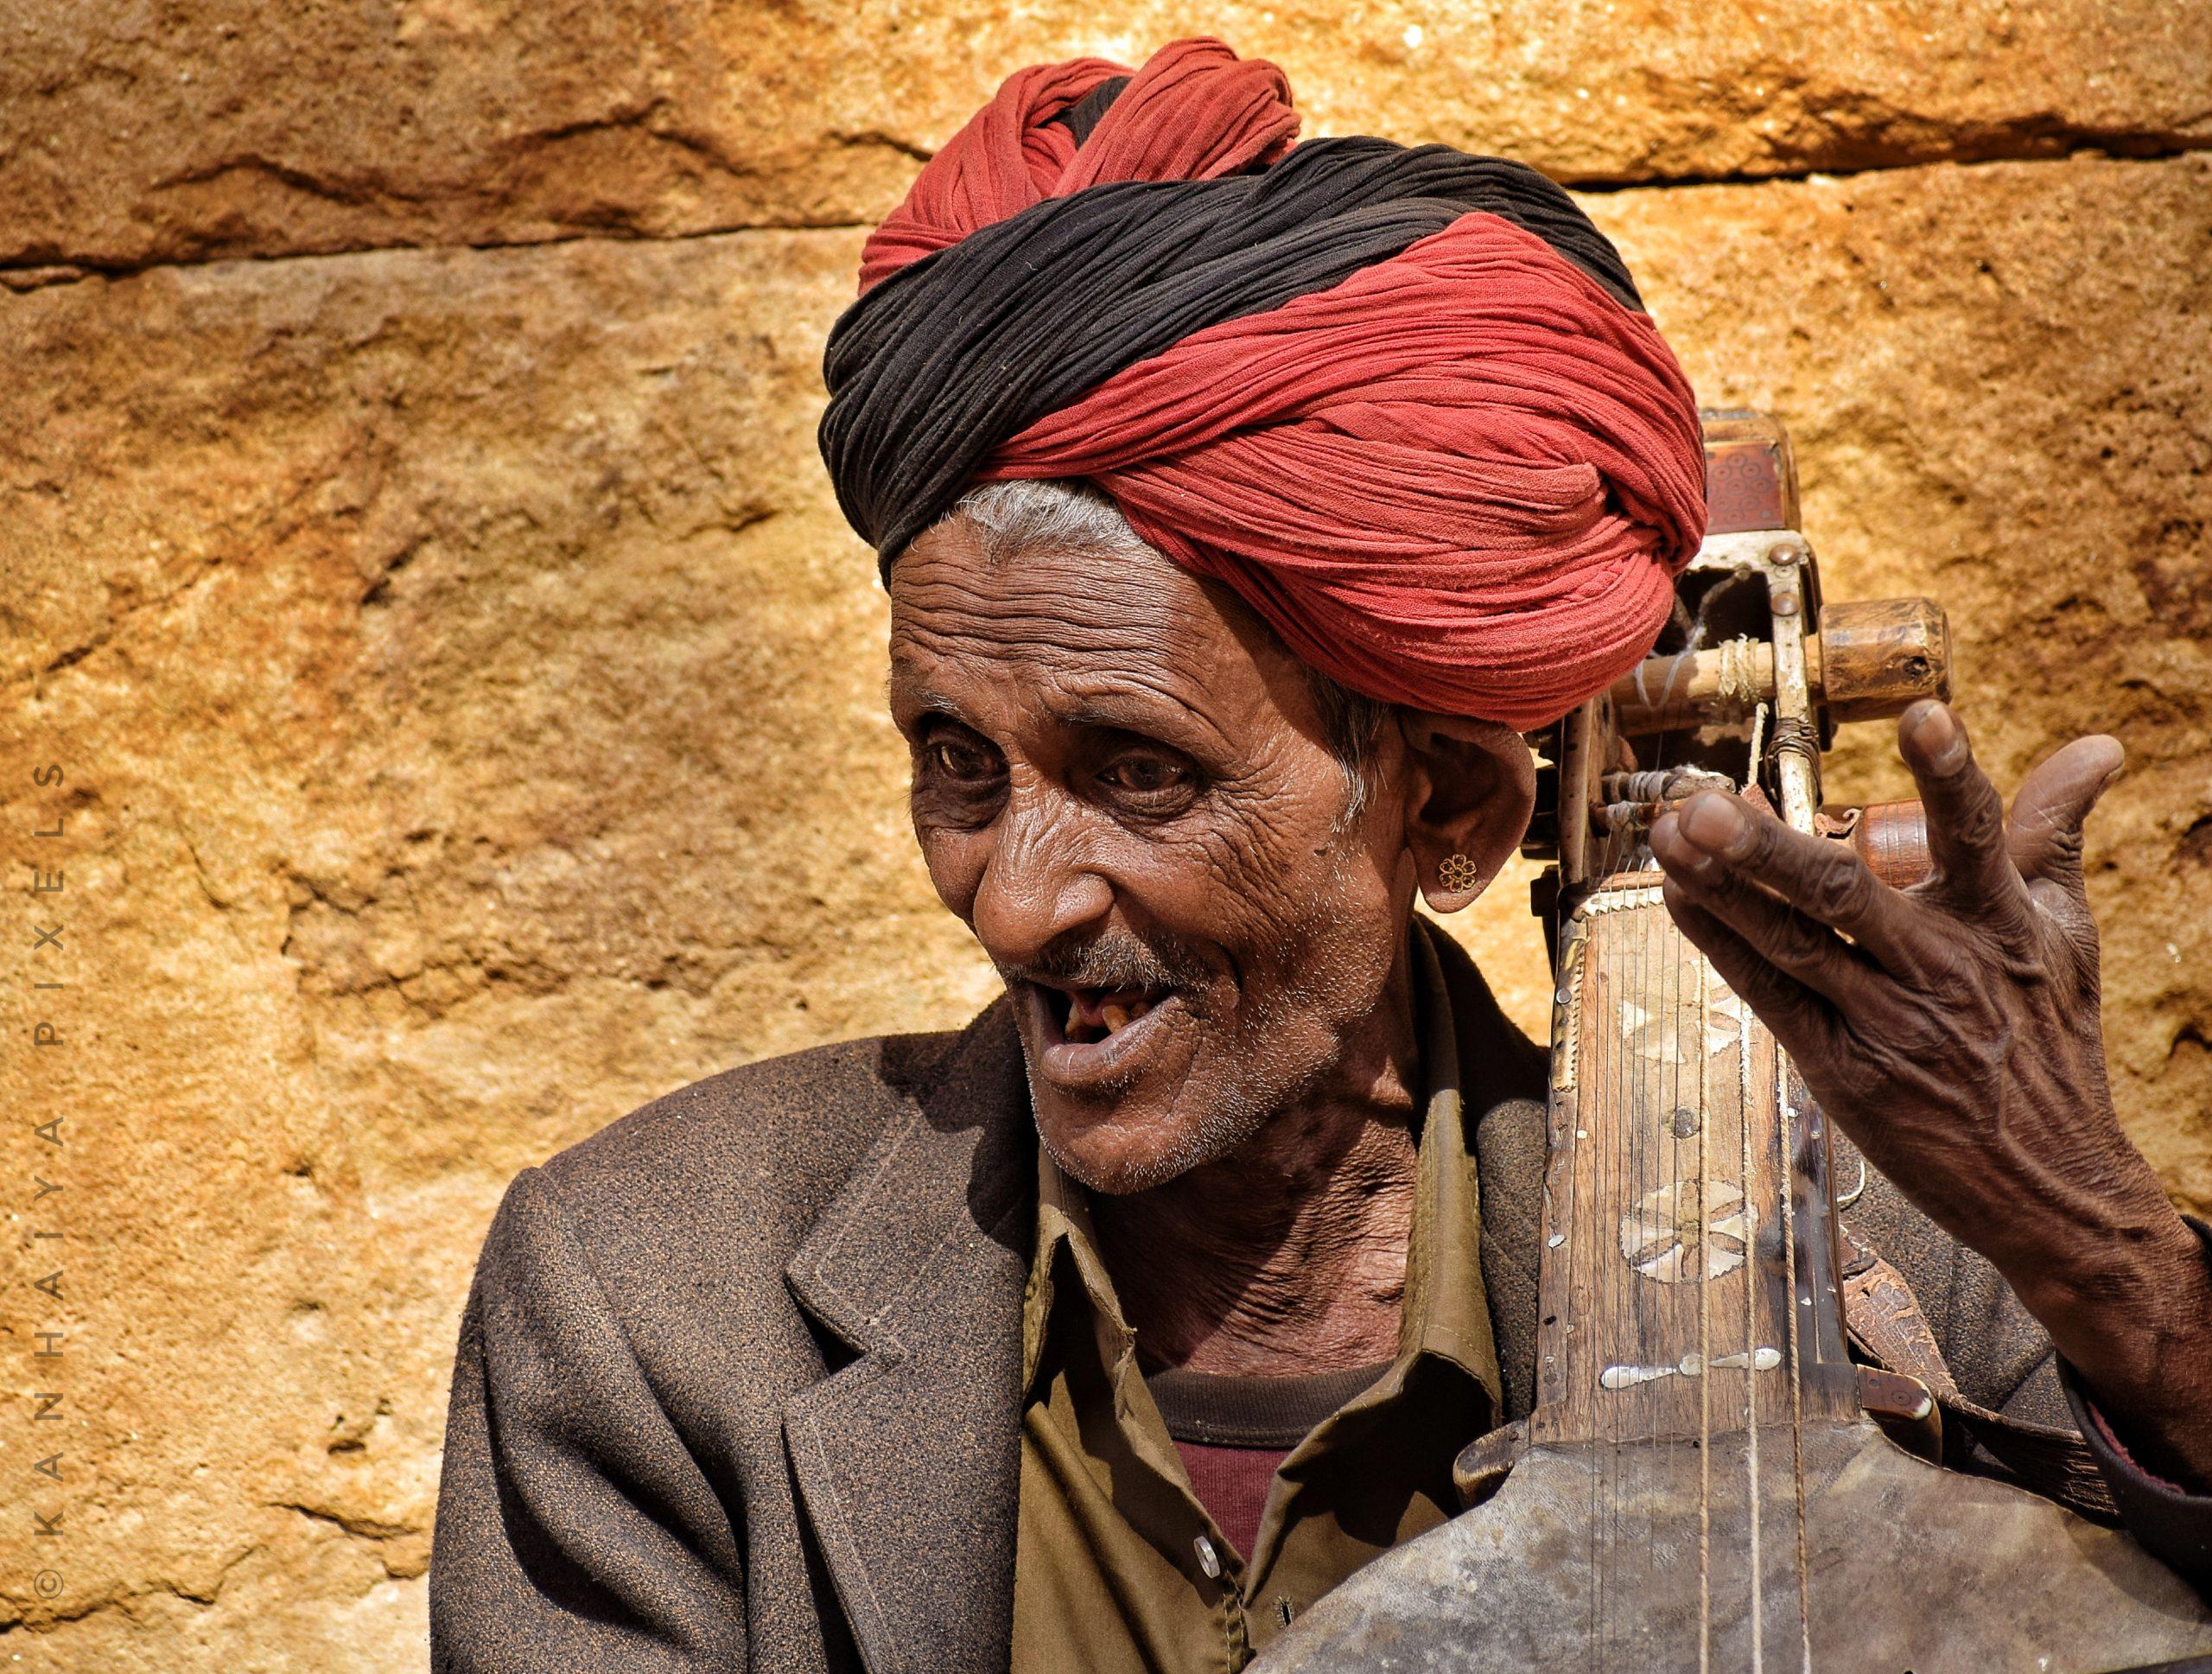 Rajasthani street musician